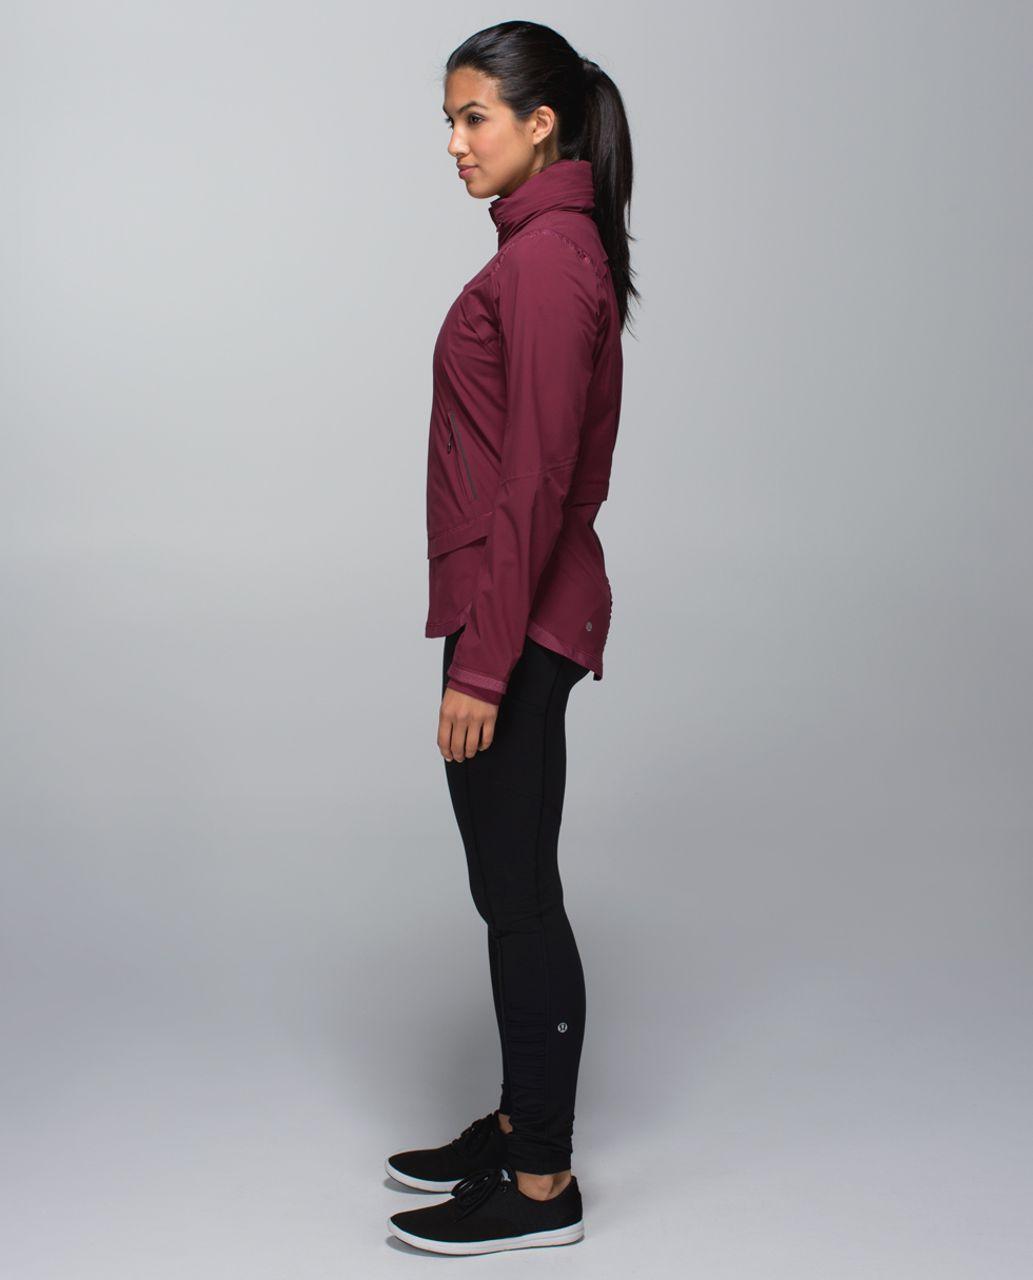 Lululemon Rain Runner Jacket - Rust Berry